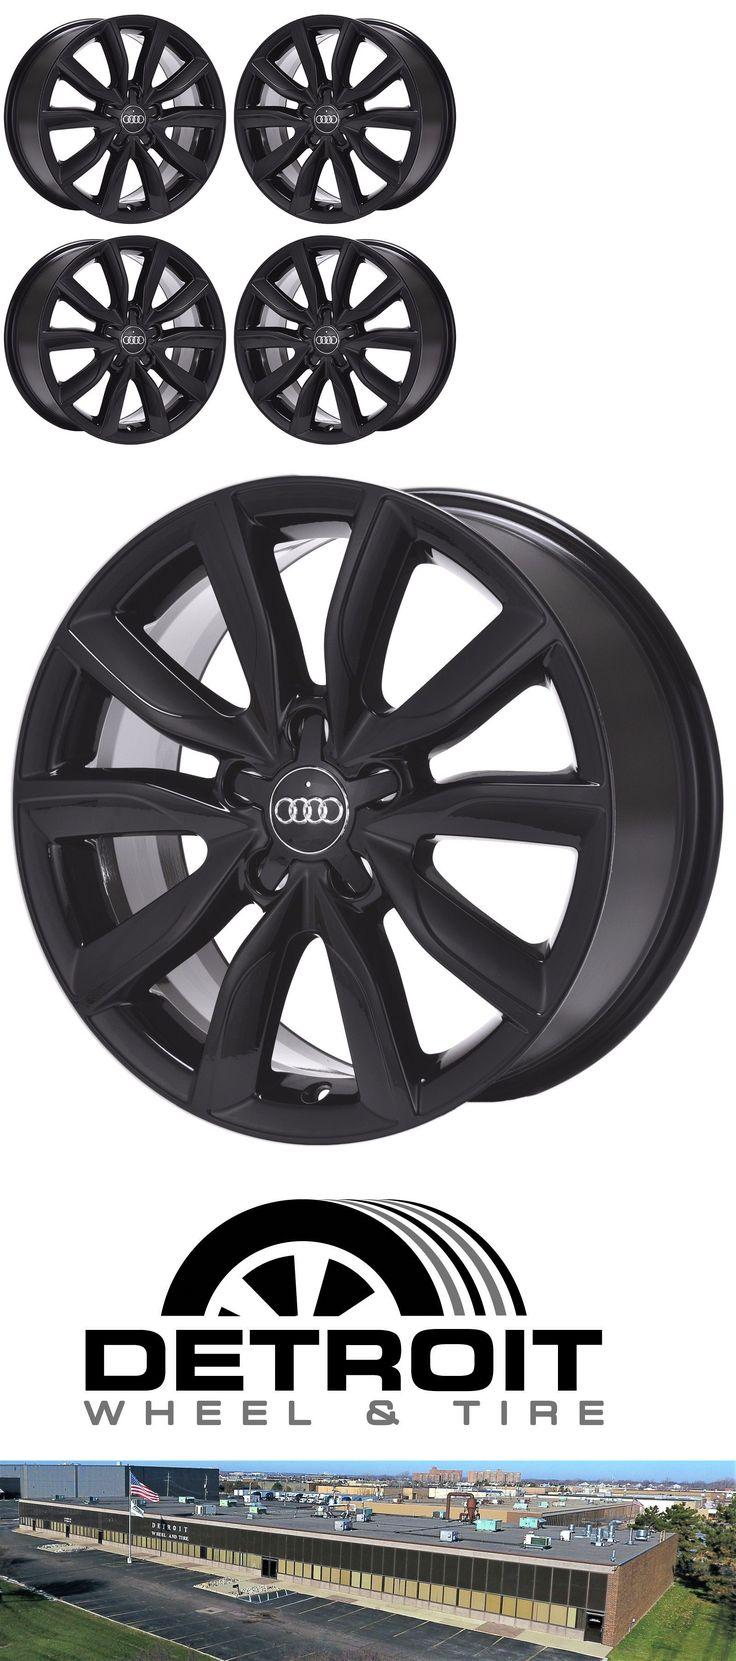 auto parts - general: 17 Audi A3 A4 A6 Tt Black Wheels Rims Factory Oem Set 4 58832 -> BUY IT NOW ONLY: $569.05 on eBay!